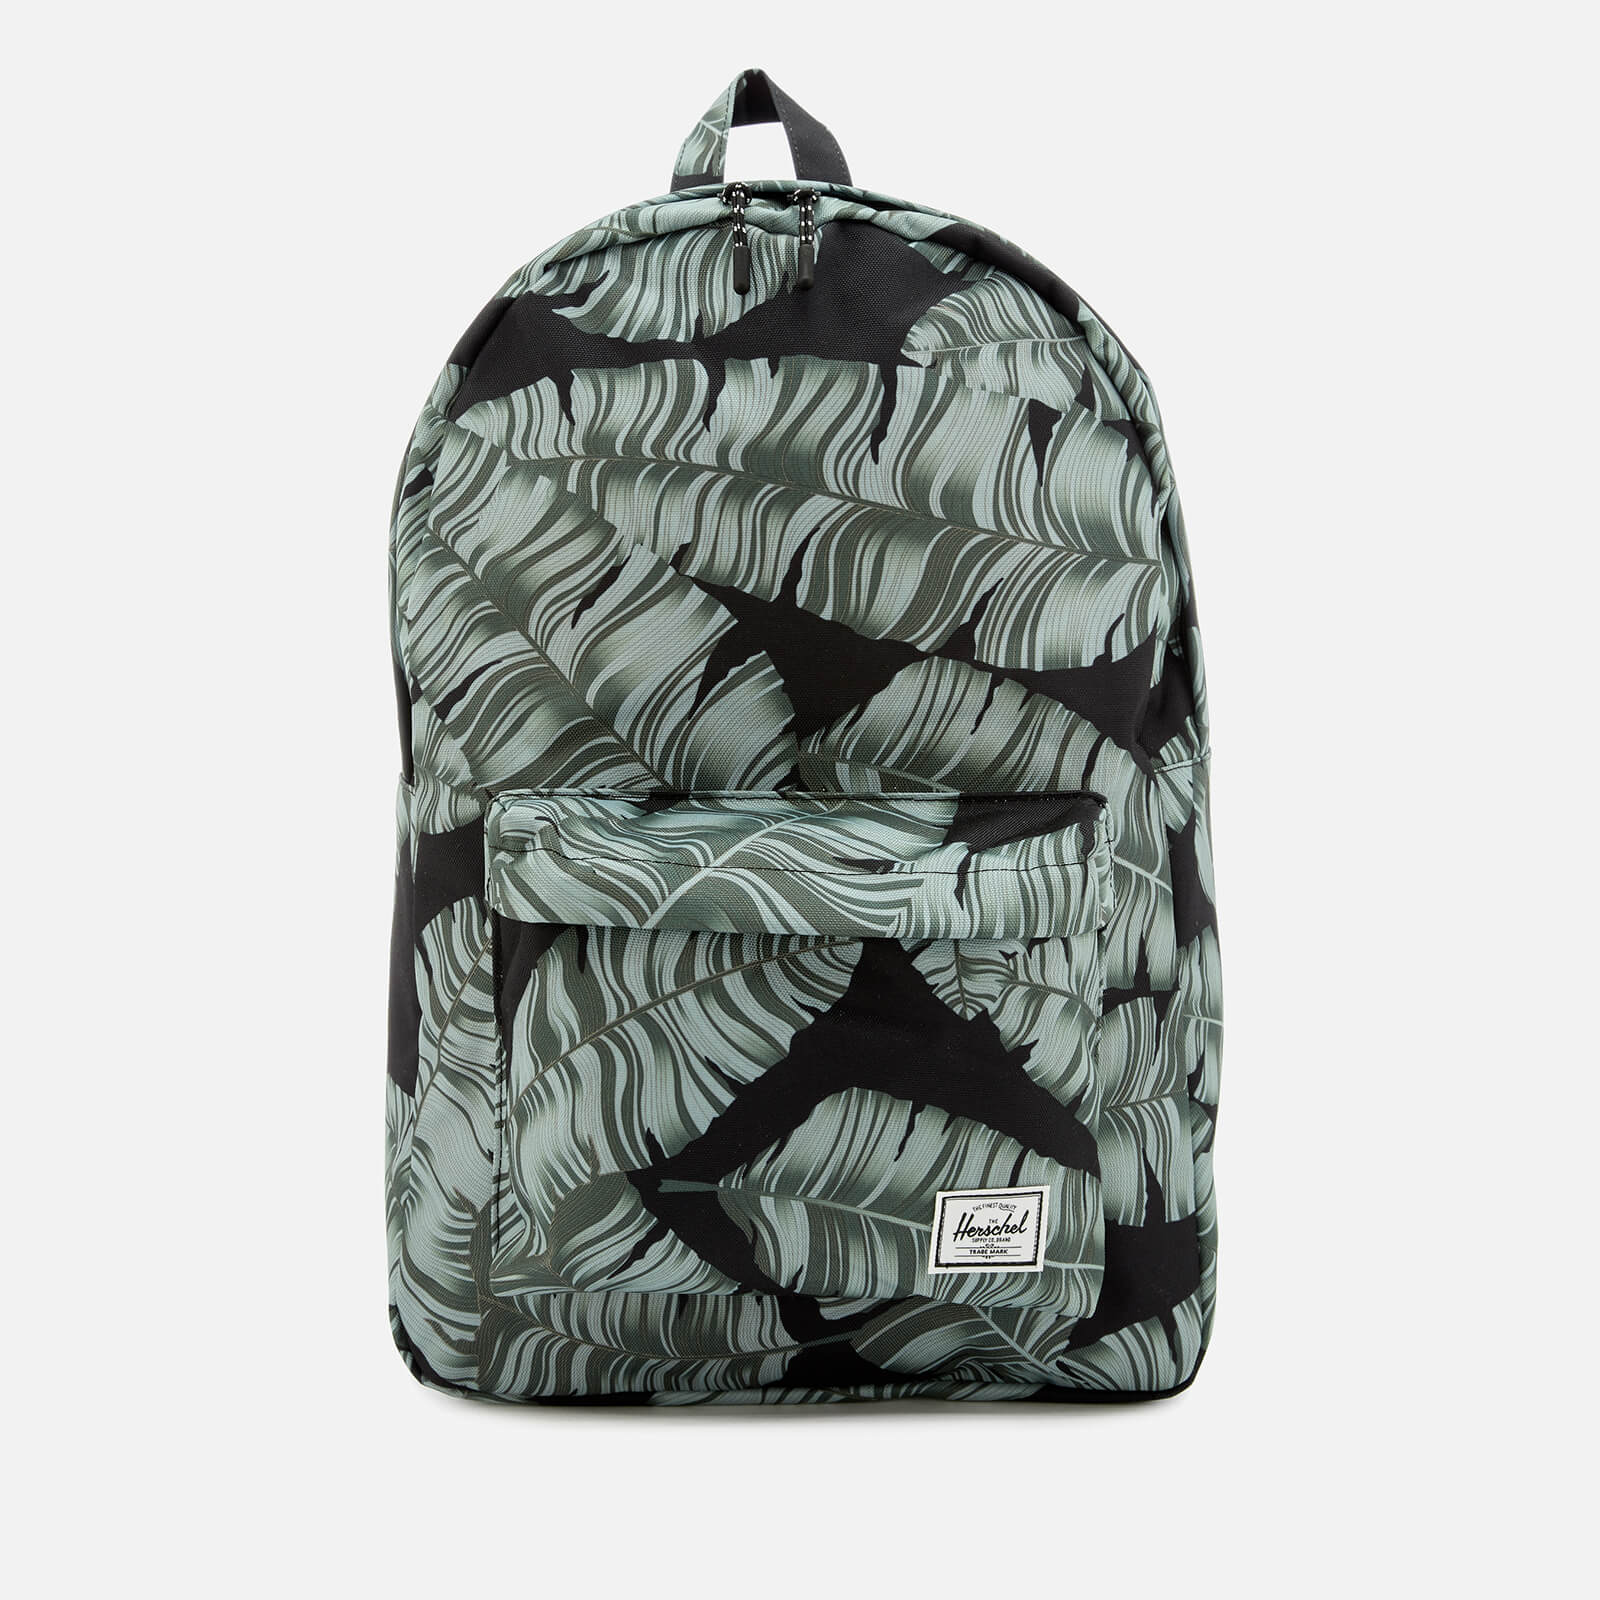 9c6dda7c02 Men s Classic Backpack - Black Palm Herschel Supply Co. Men s Classic  Backpack - Black Palm